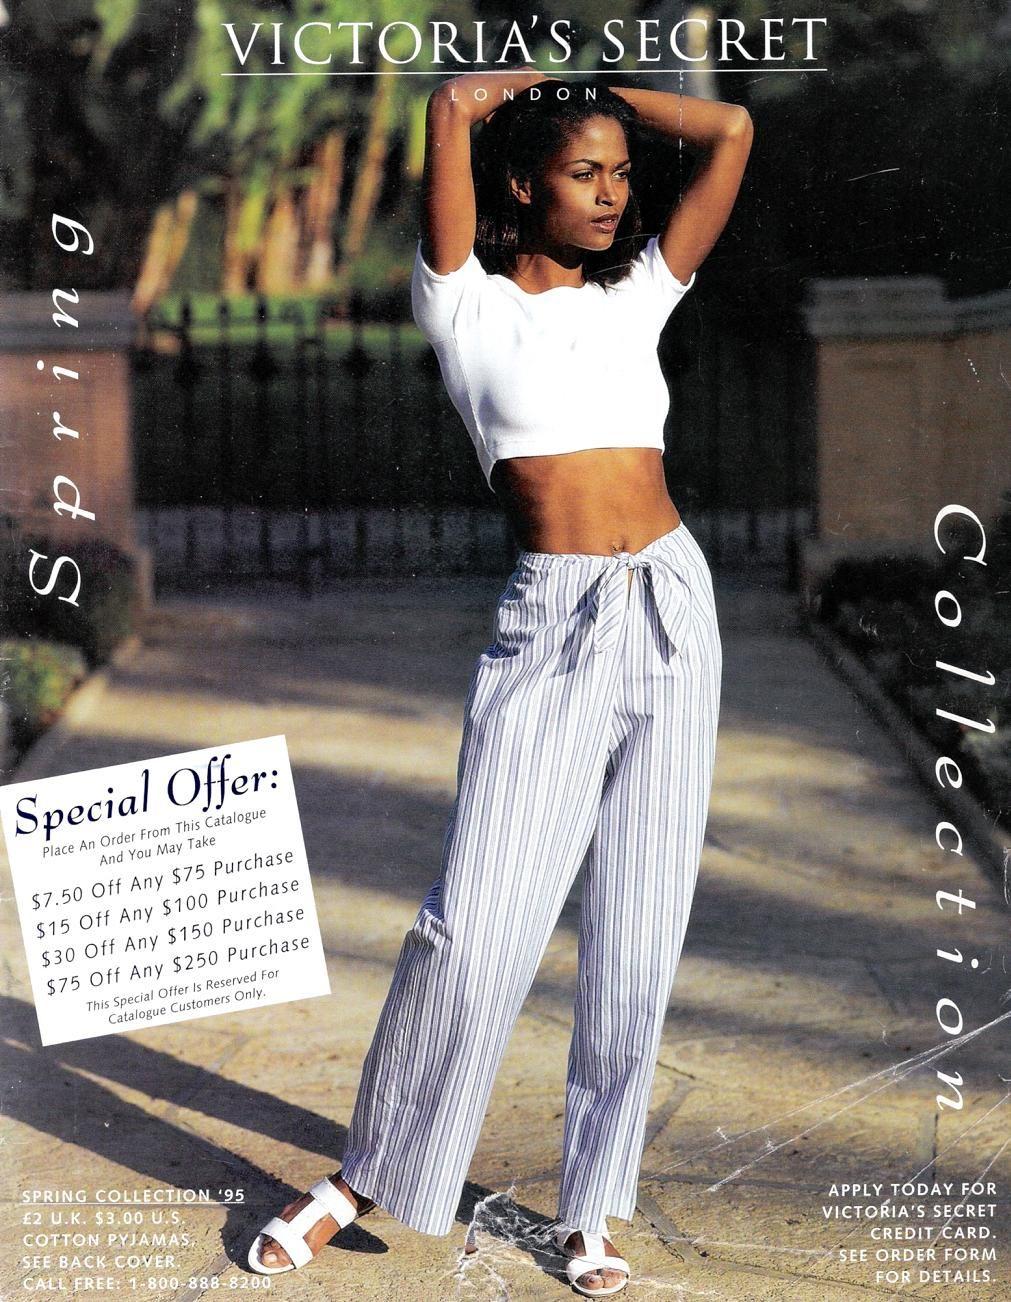 Karen Alexander USA 1 1995